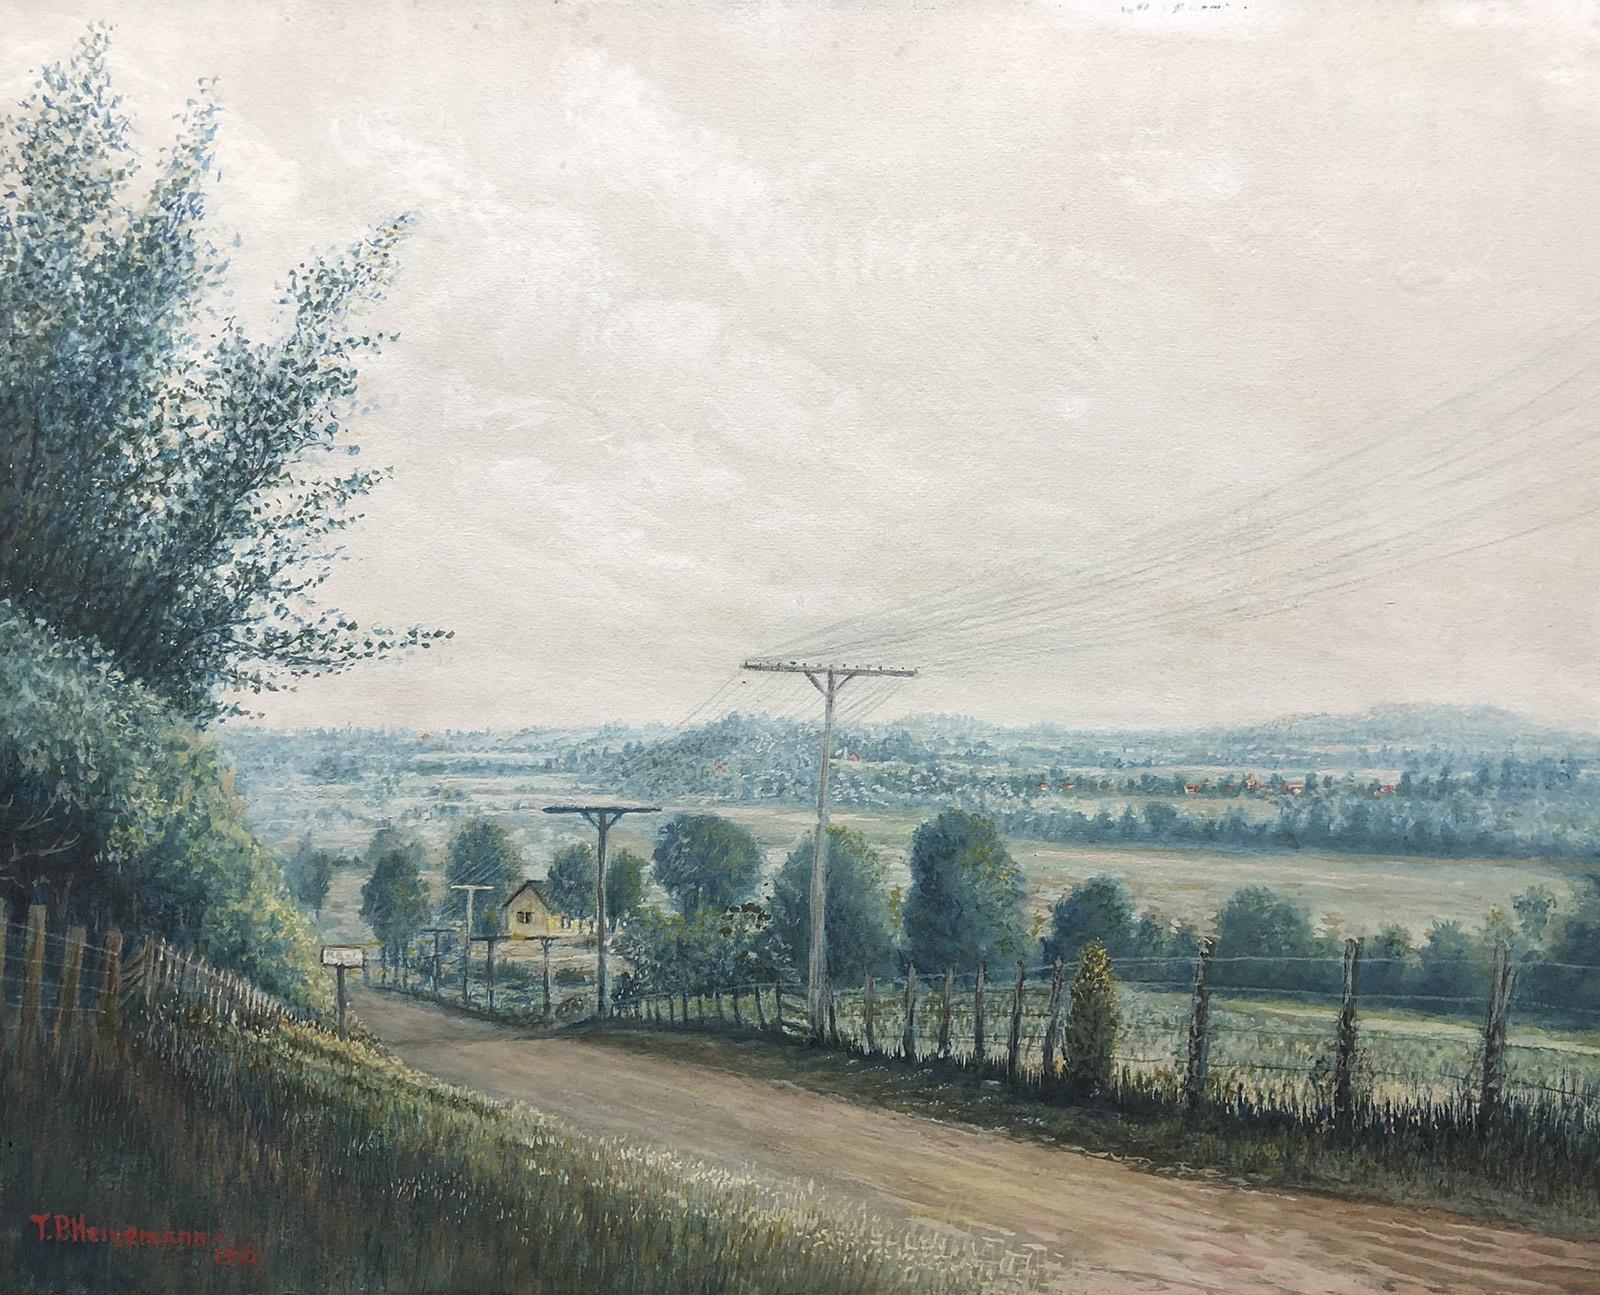 T P Heinemann - Connersville Painting (for web).jpg